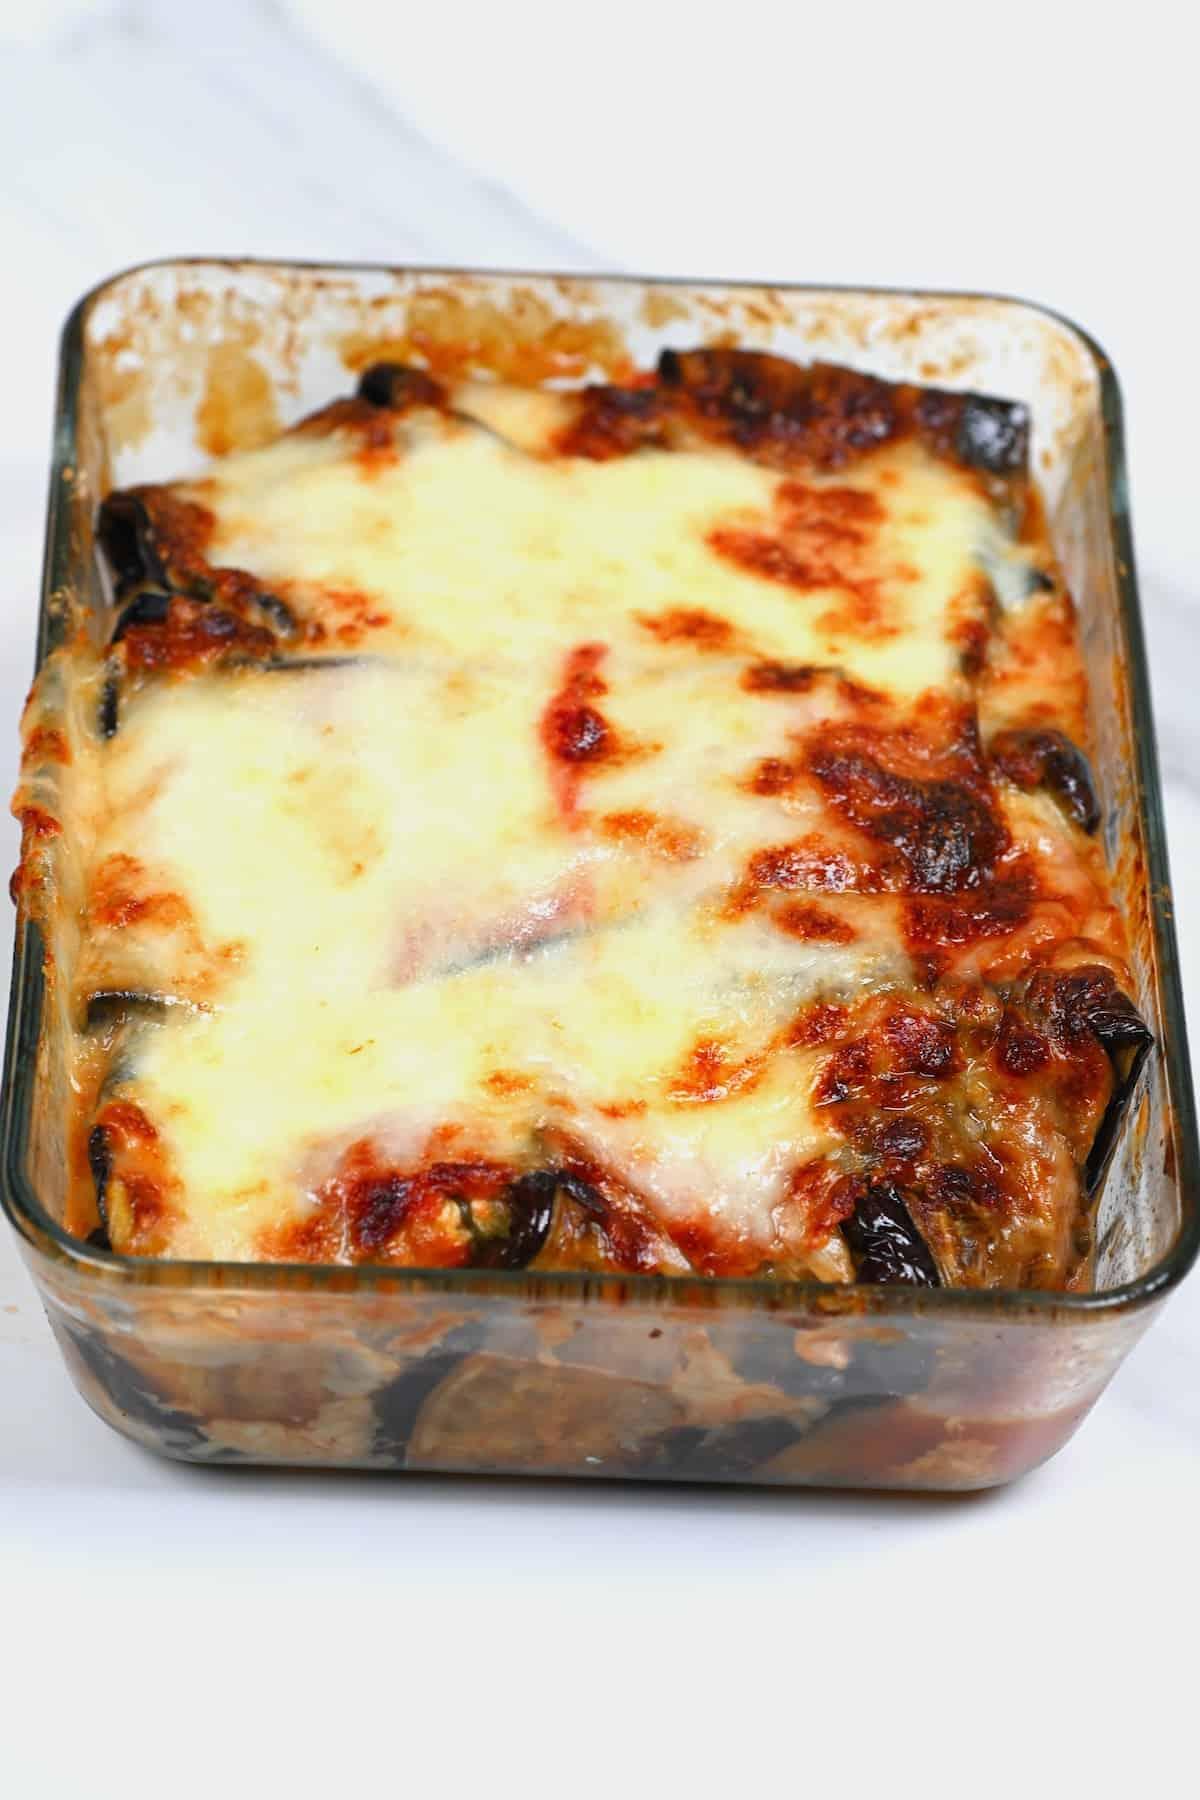 Baked parmigiana